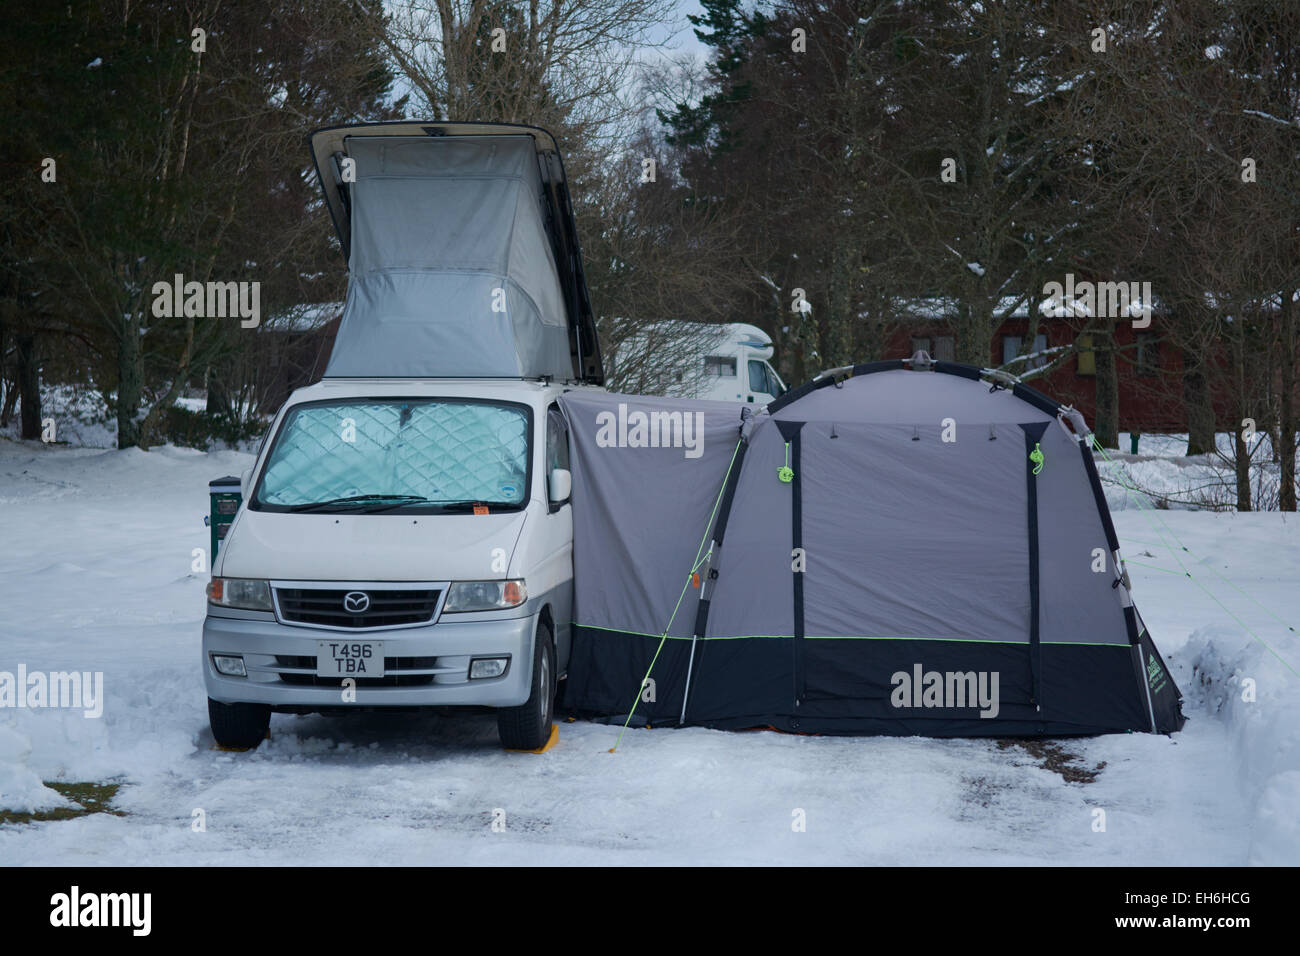 Caravans And Motorhomes Winter Camping